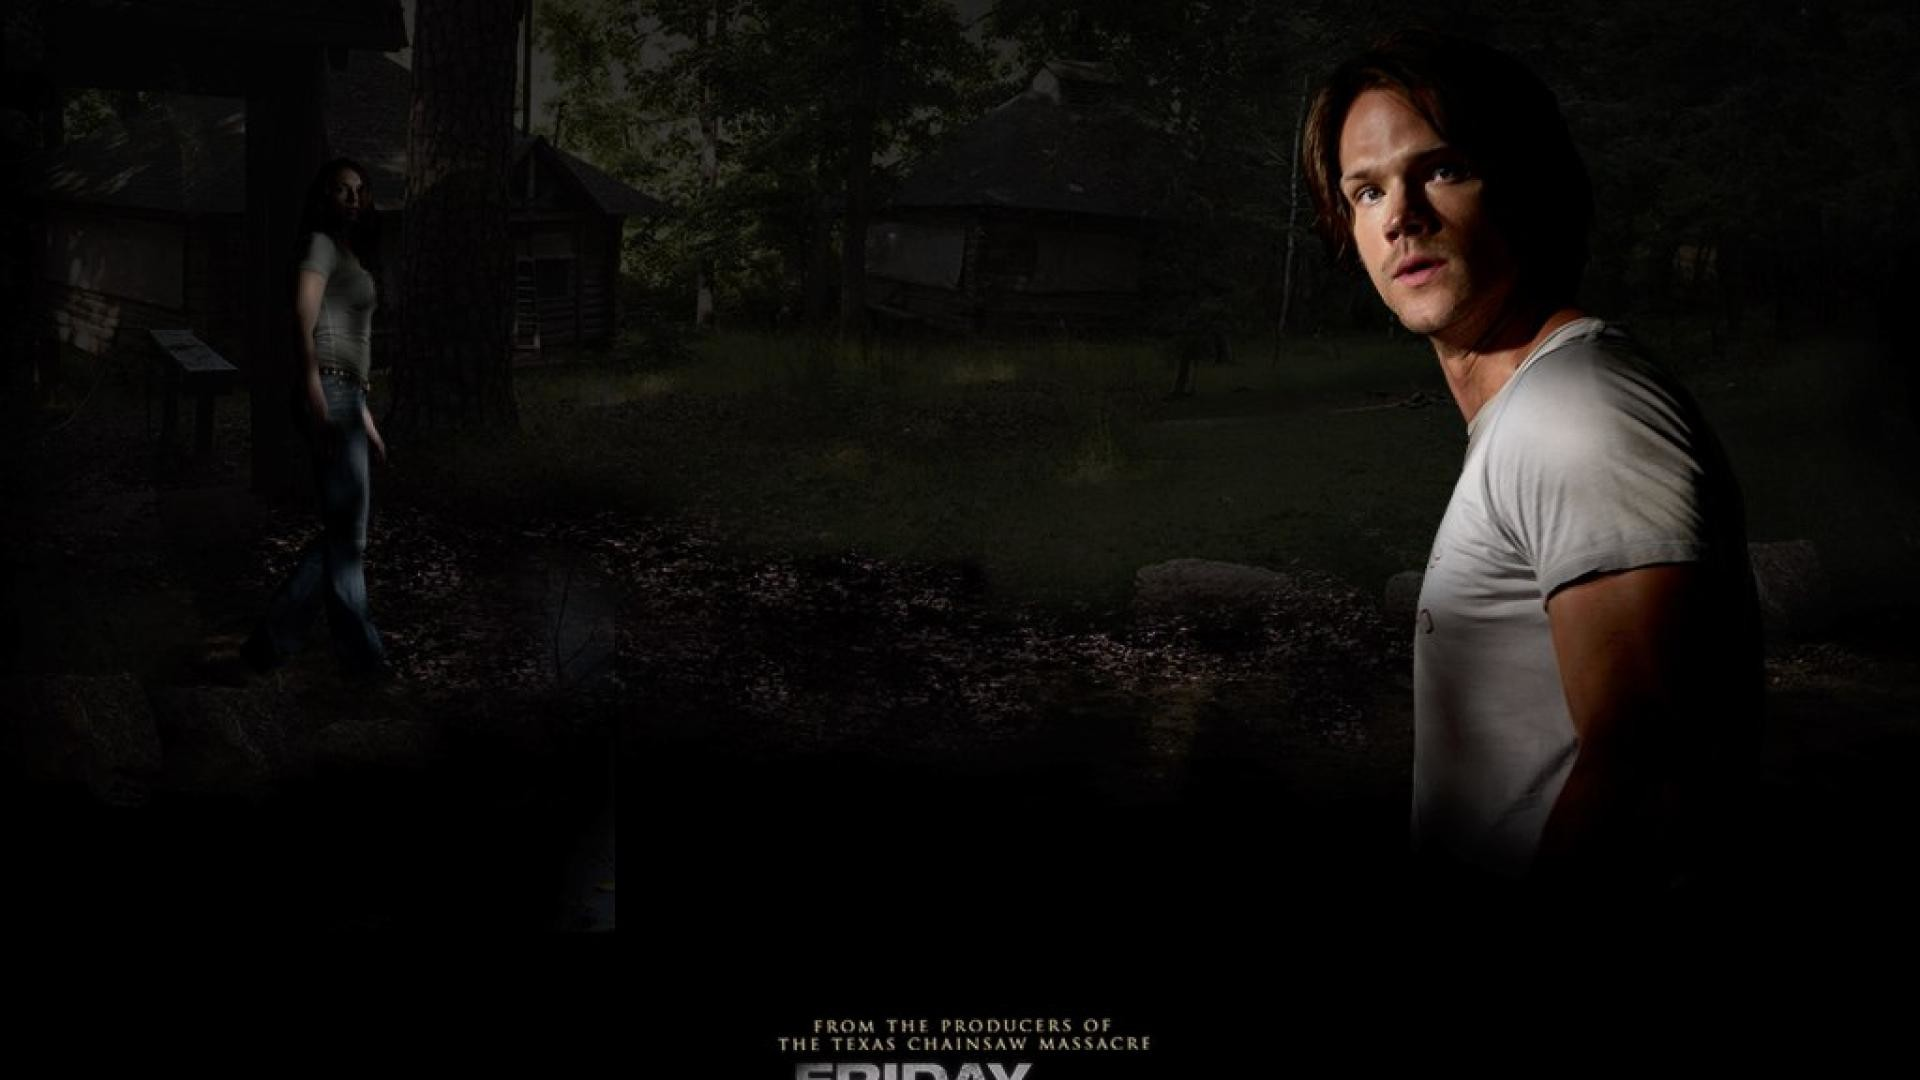 Jared Padalecki Movies. Other Resolution: Misha Collins Jensen Ackles Jared  Padalecki Wallpaper